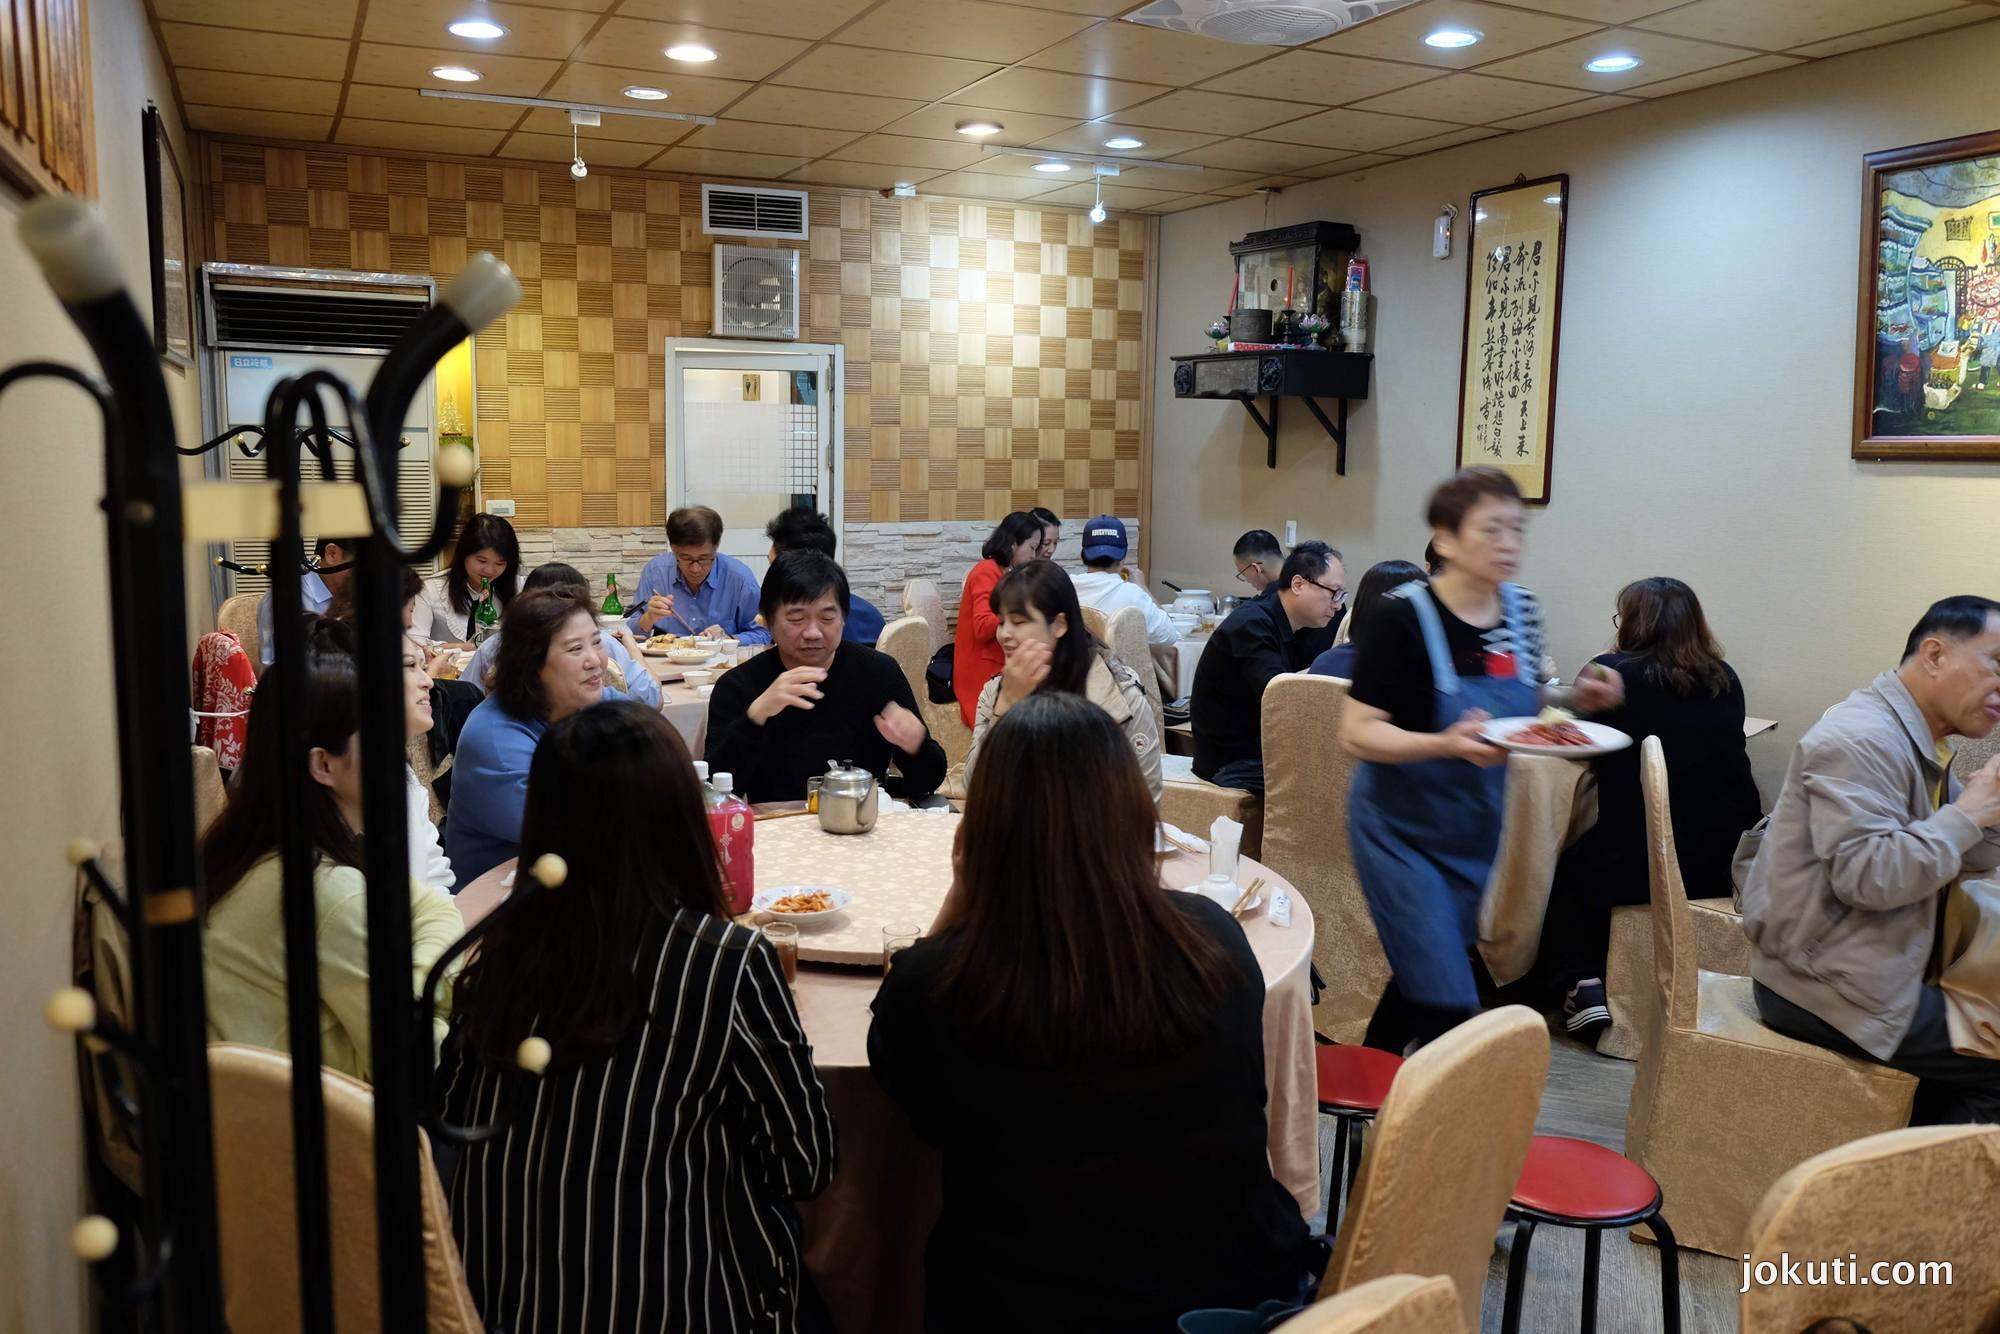 dscf2936_taipei_ming_fu_seafood_michelin_taiwan_vilagevo_jokuti.jpg